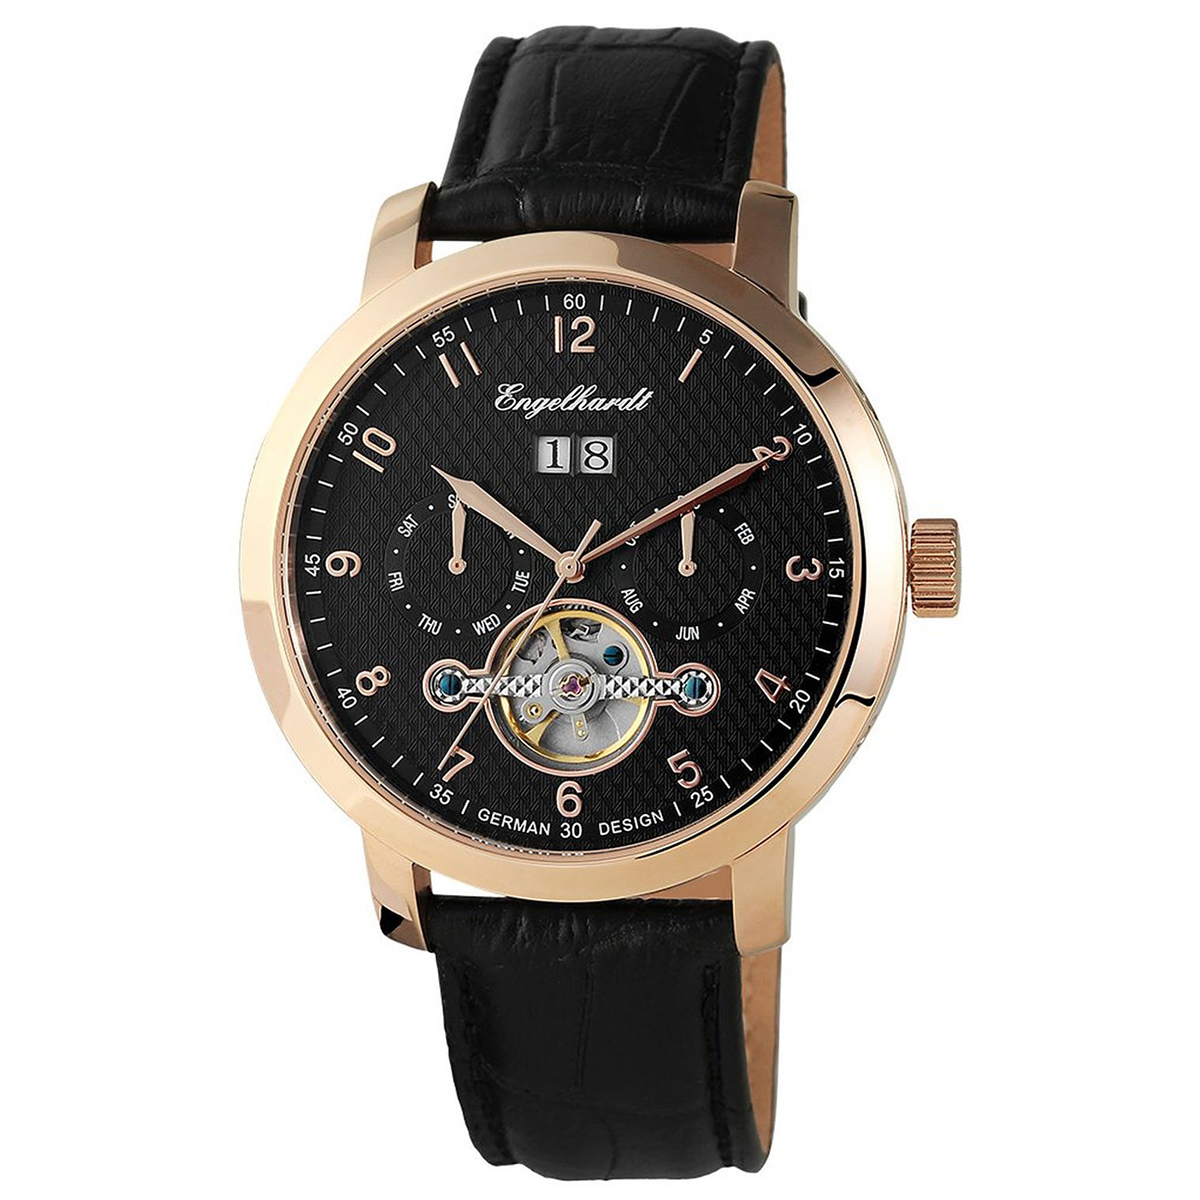 Engelhardt エンゲルハート 自動巻き 腕時計 メンズ ドイツ製 [388931029008] 並行輸入品 純正ケース付き【訳アリ価格:メーカー保証なし】